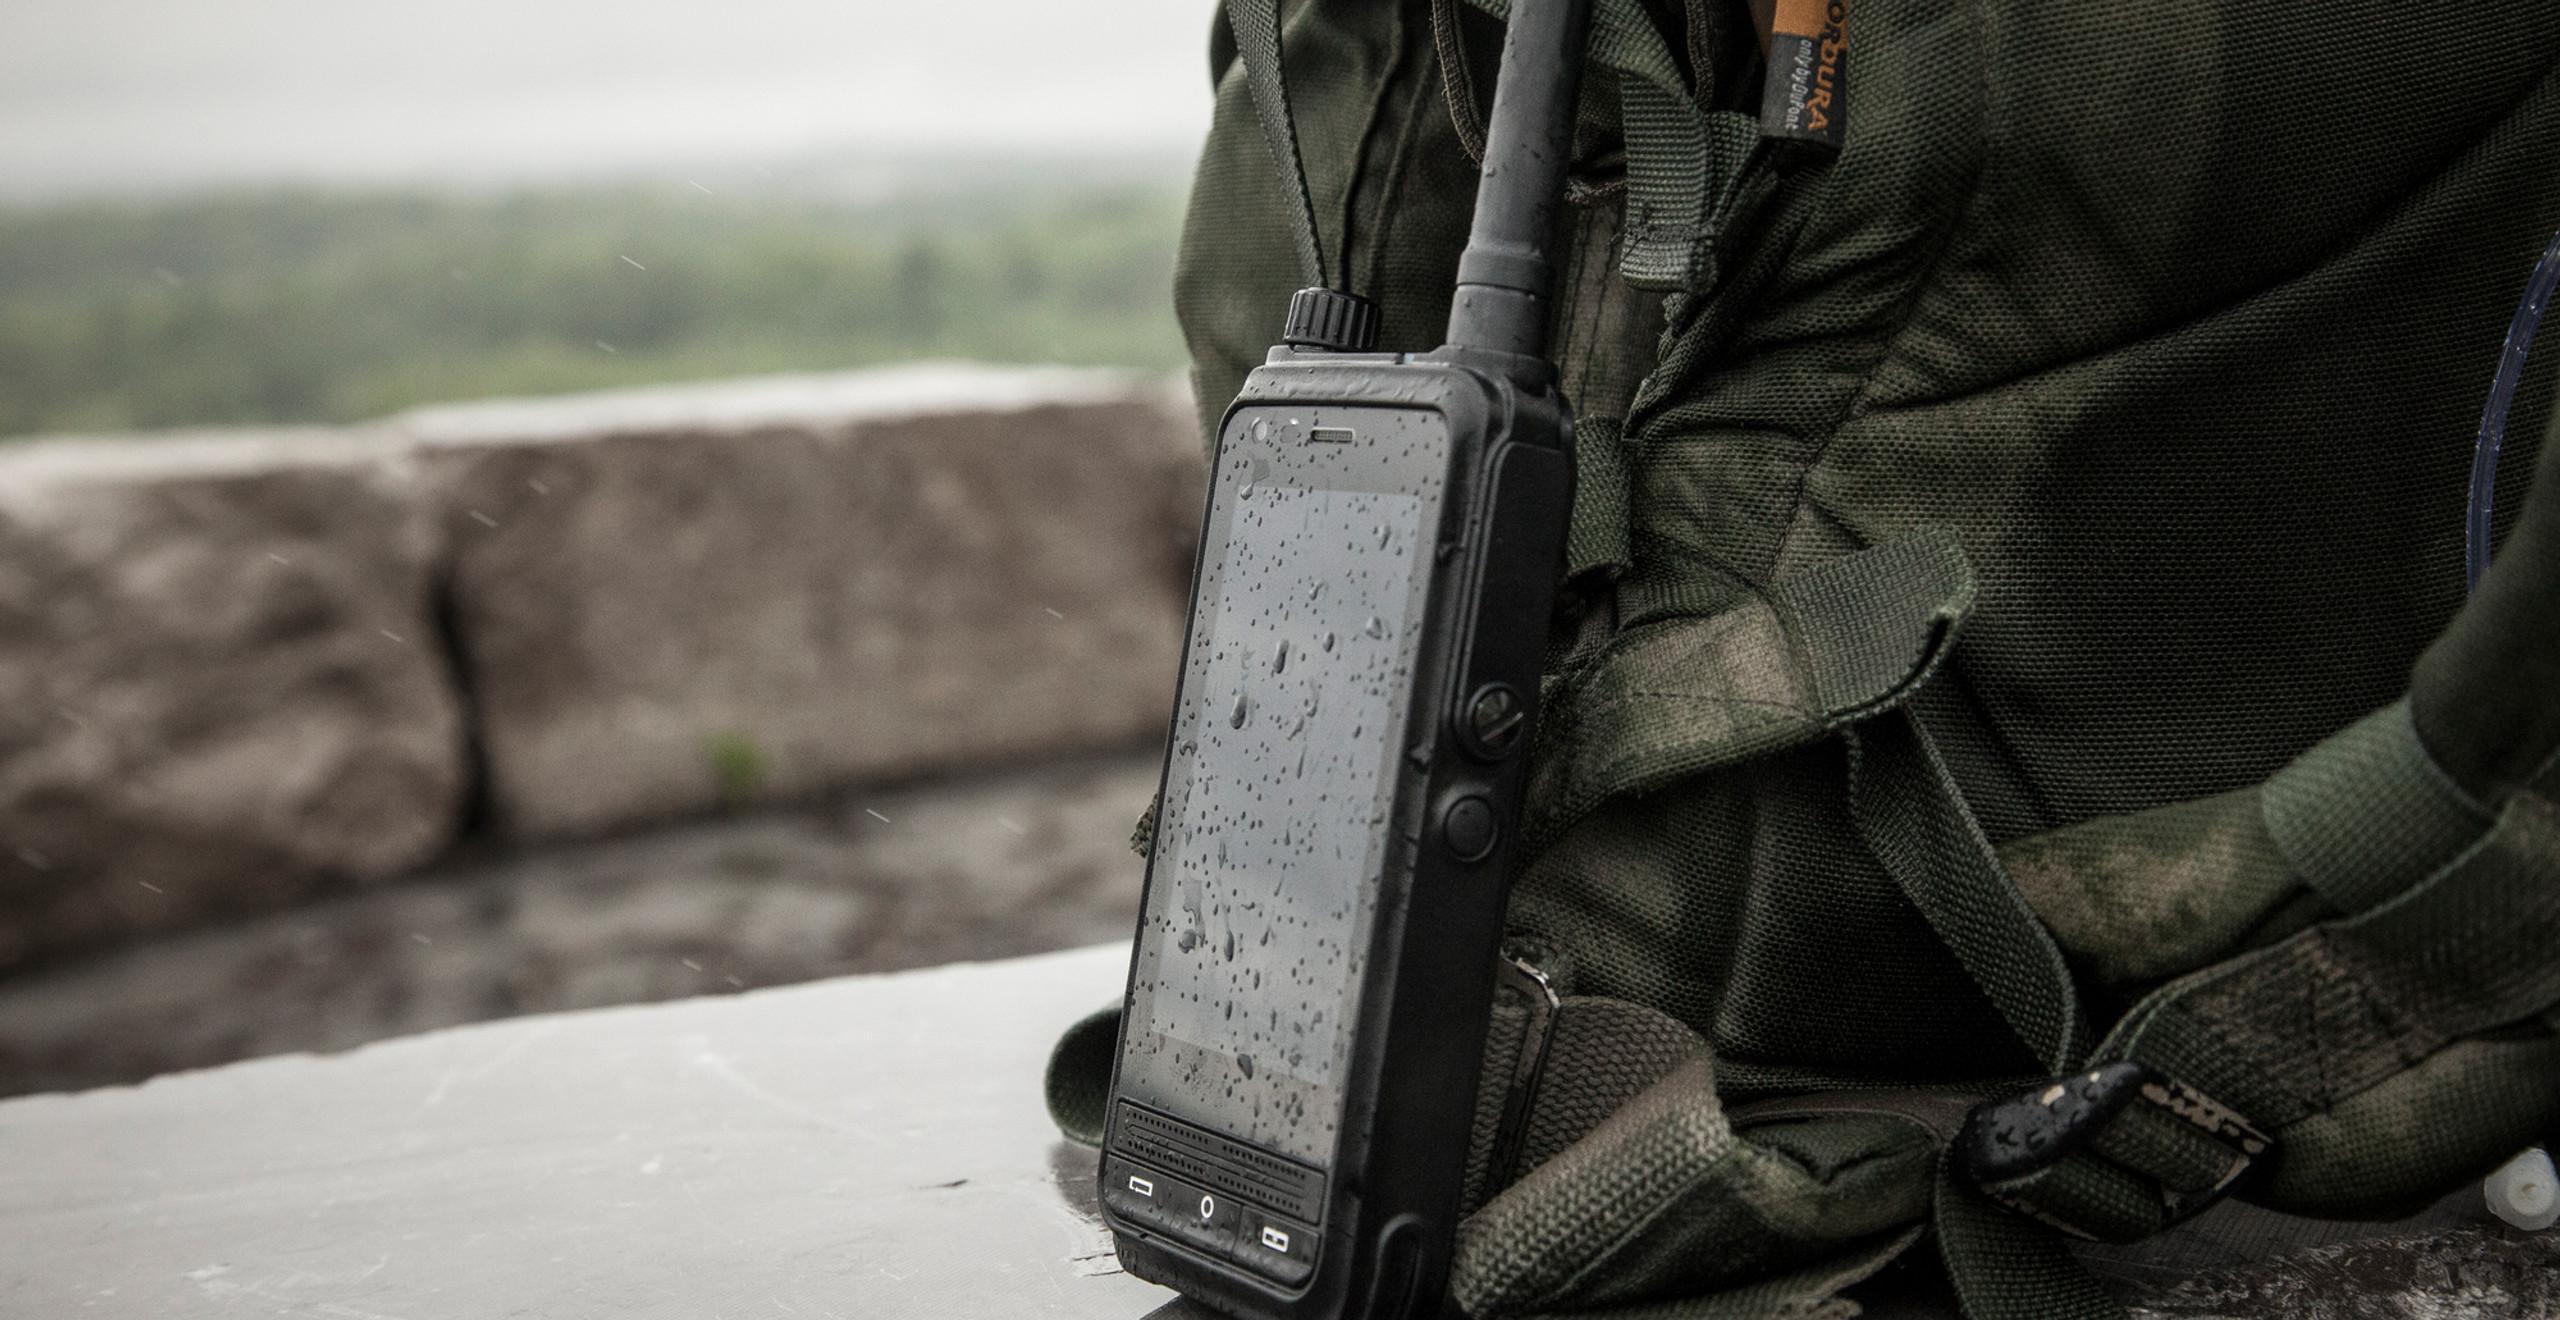 Boxchip S900B Zello tactical accessories poc radio blackline simulations milsim airsoft review rain waterproof